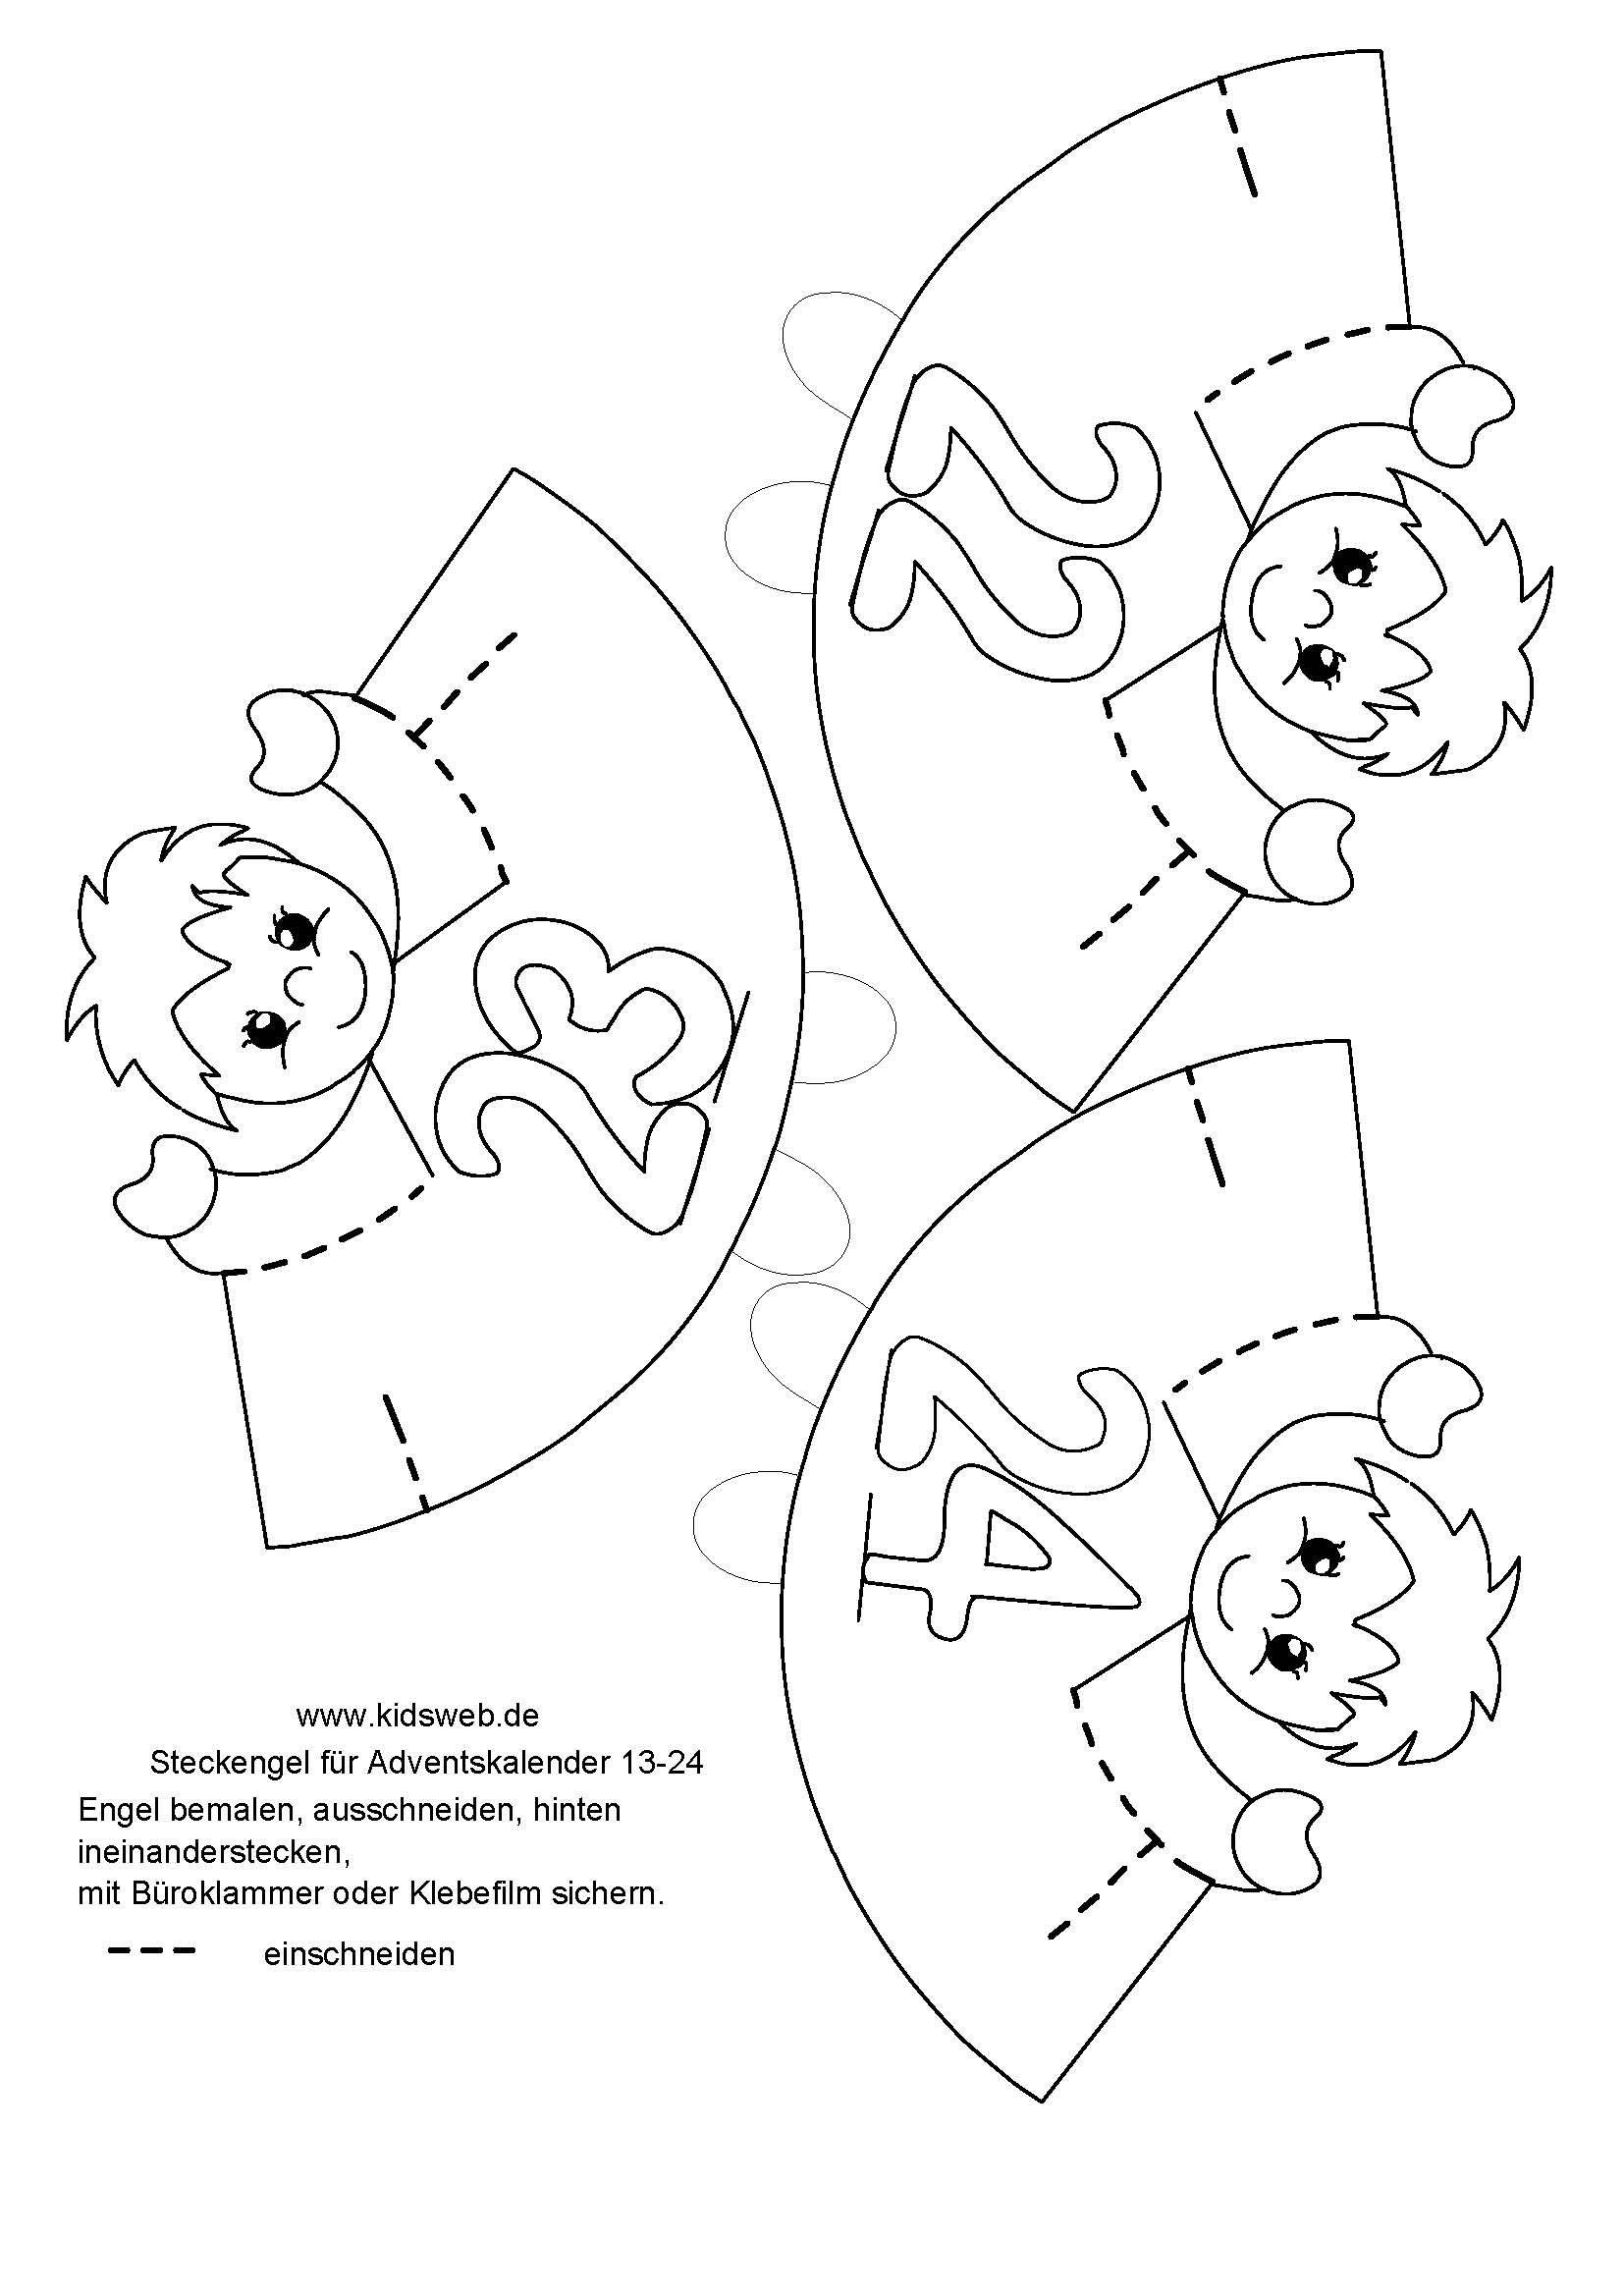 Kidsweb Weihnachtsbasteln.Advento Kalendorius Christmas Christmas Crafts Christmas Advent